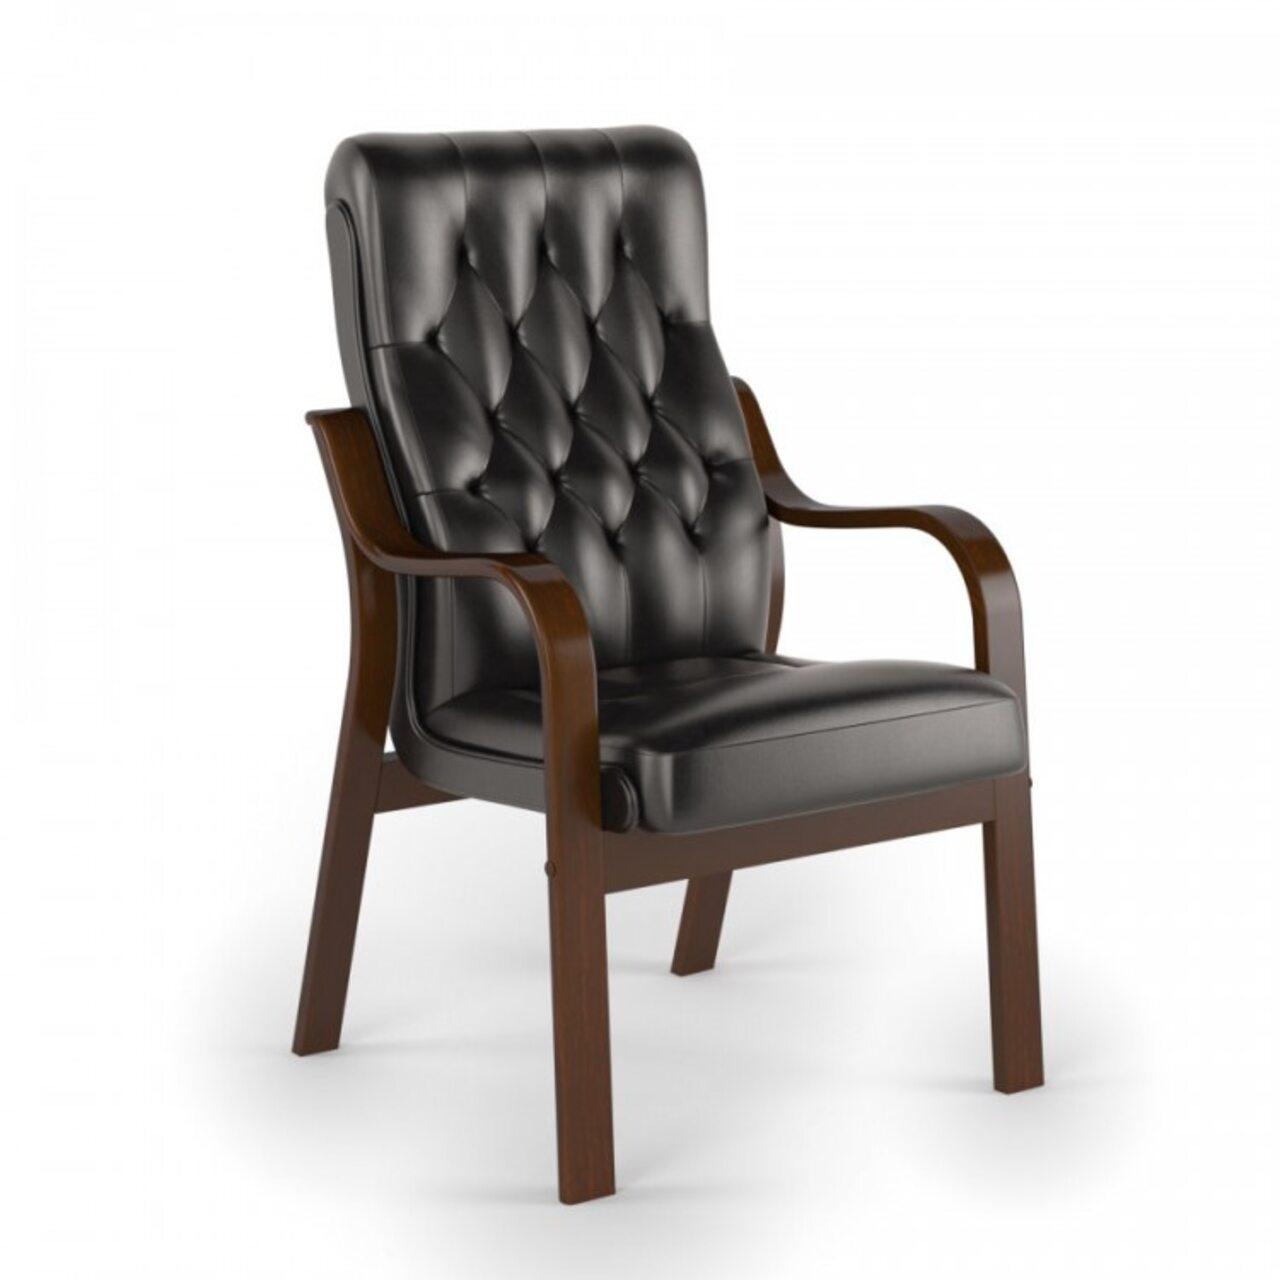 Классический стул Боттичелли DB-13LB - фото 2